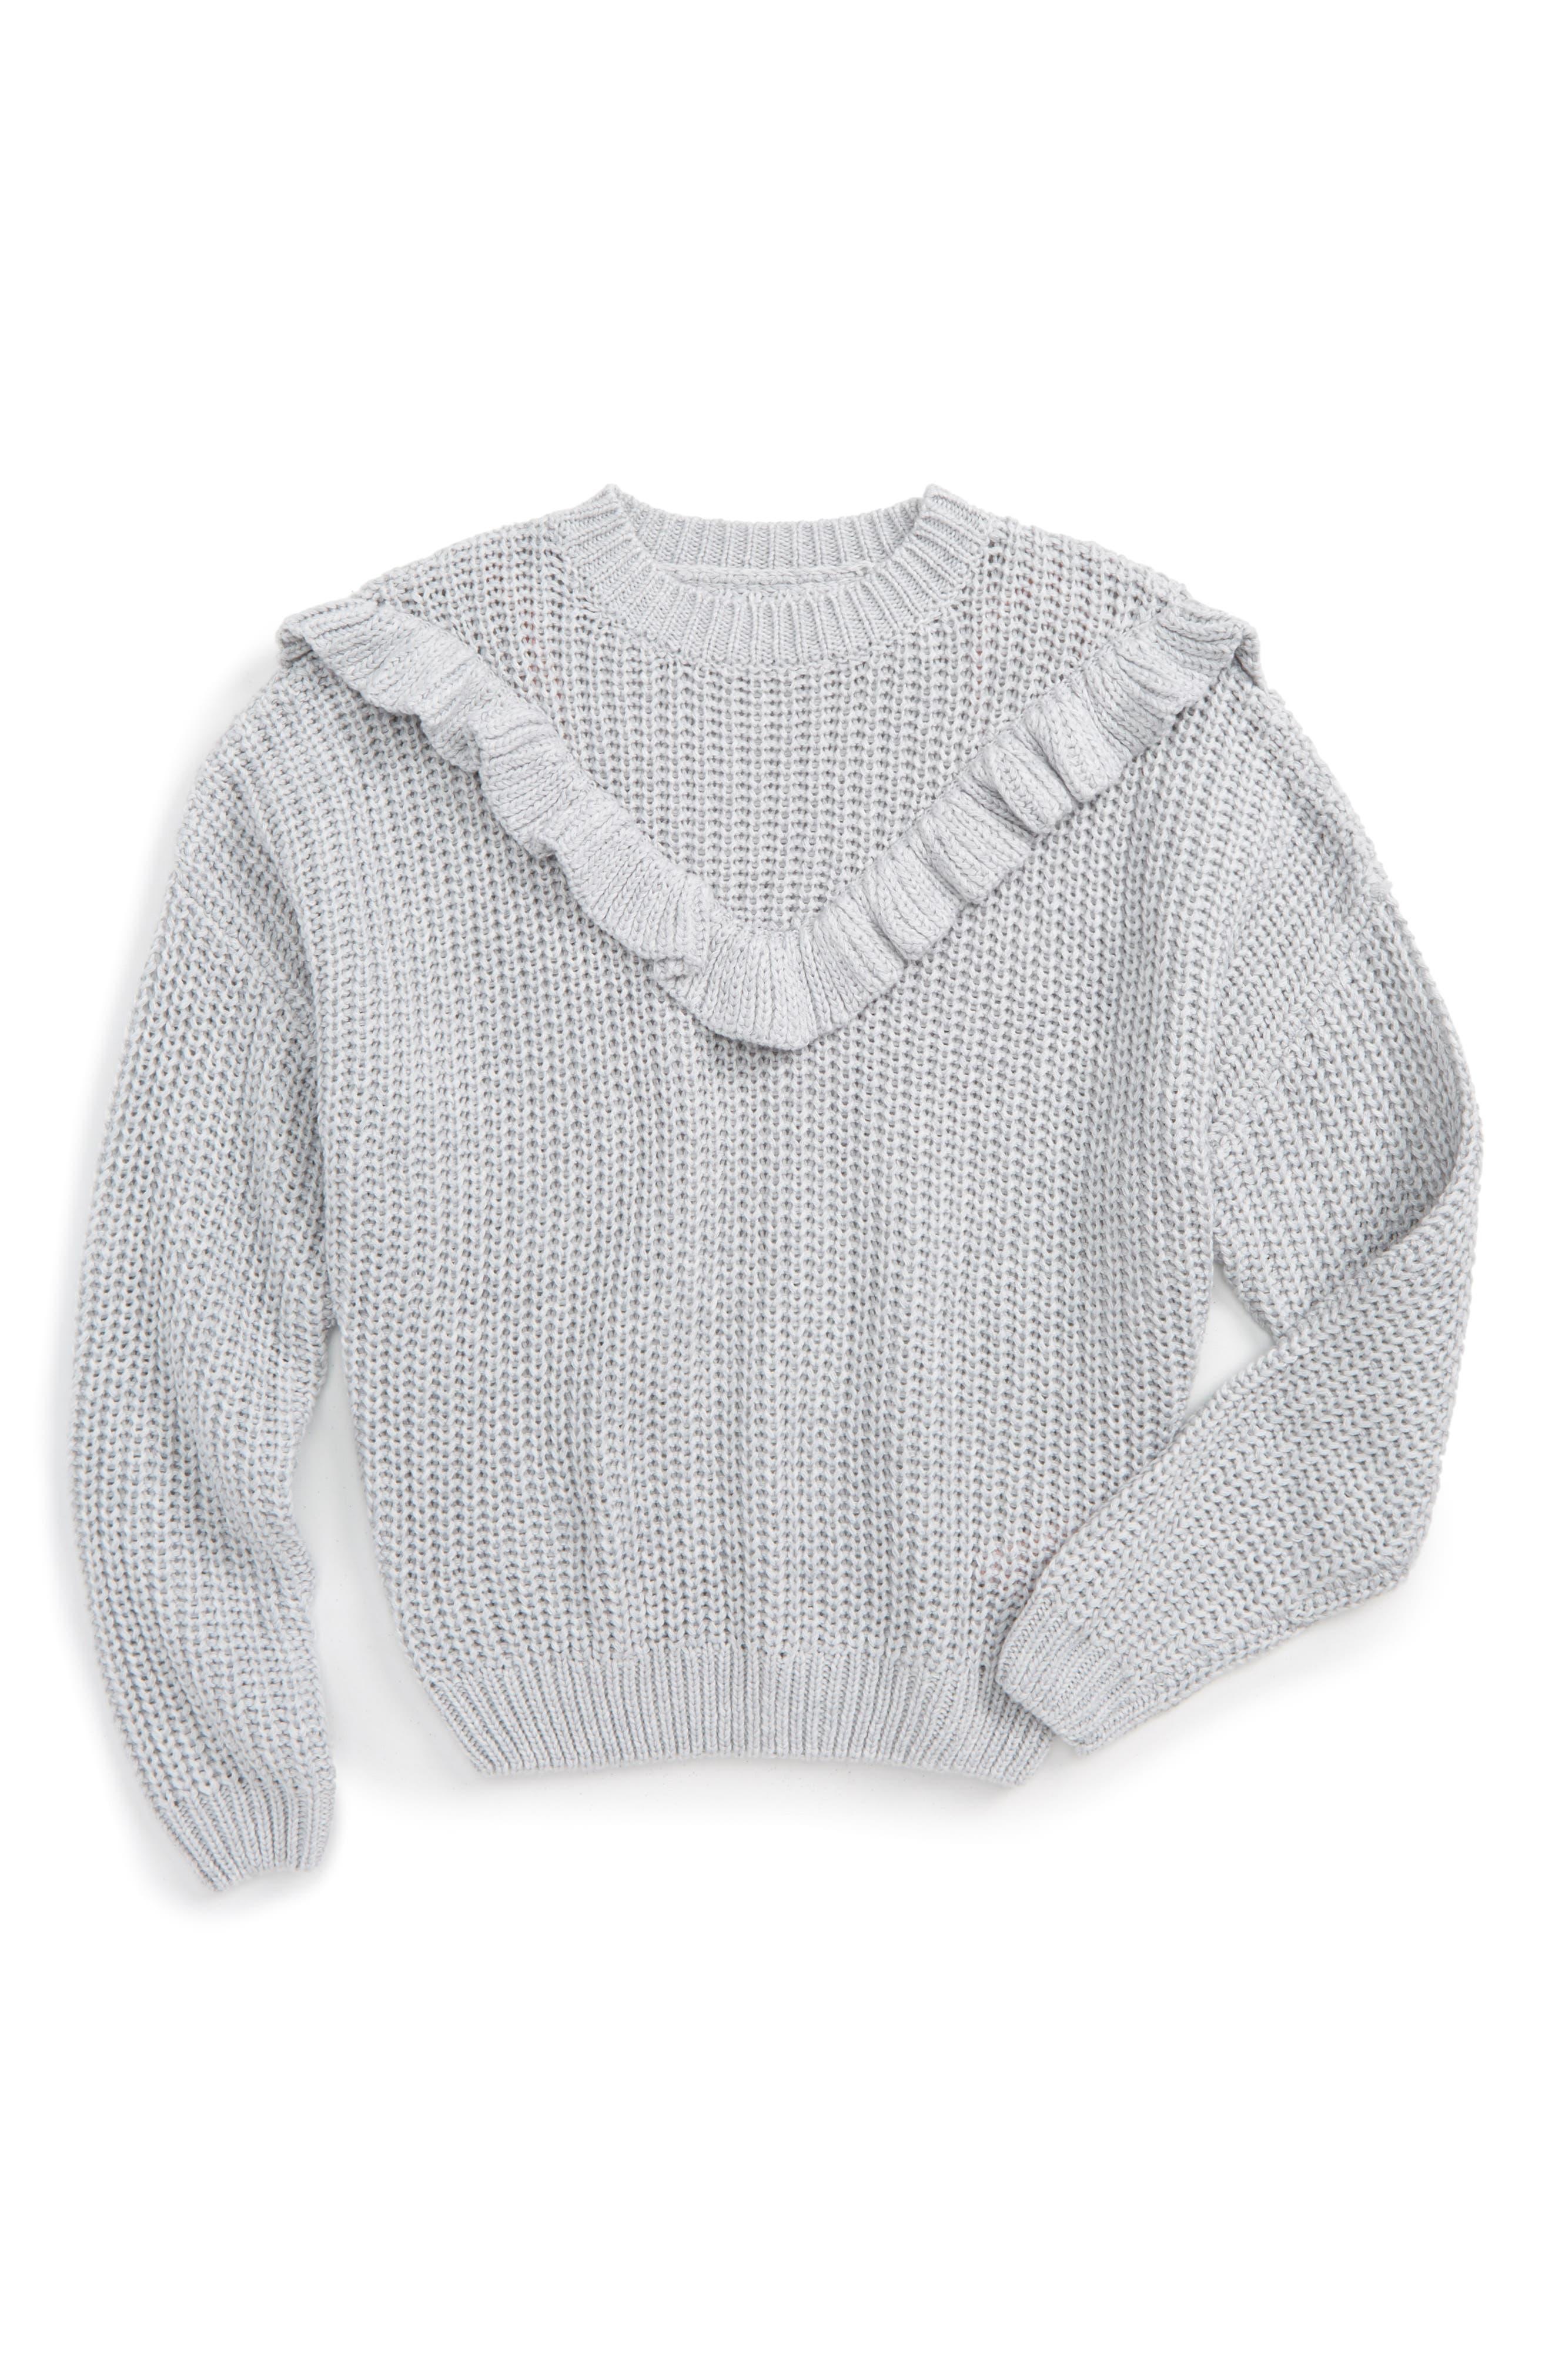 BLANCNYC Ruffle Sweater (Big Girls)